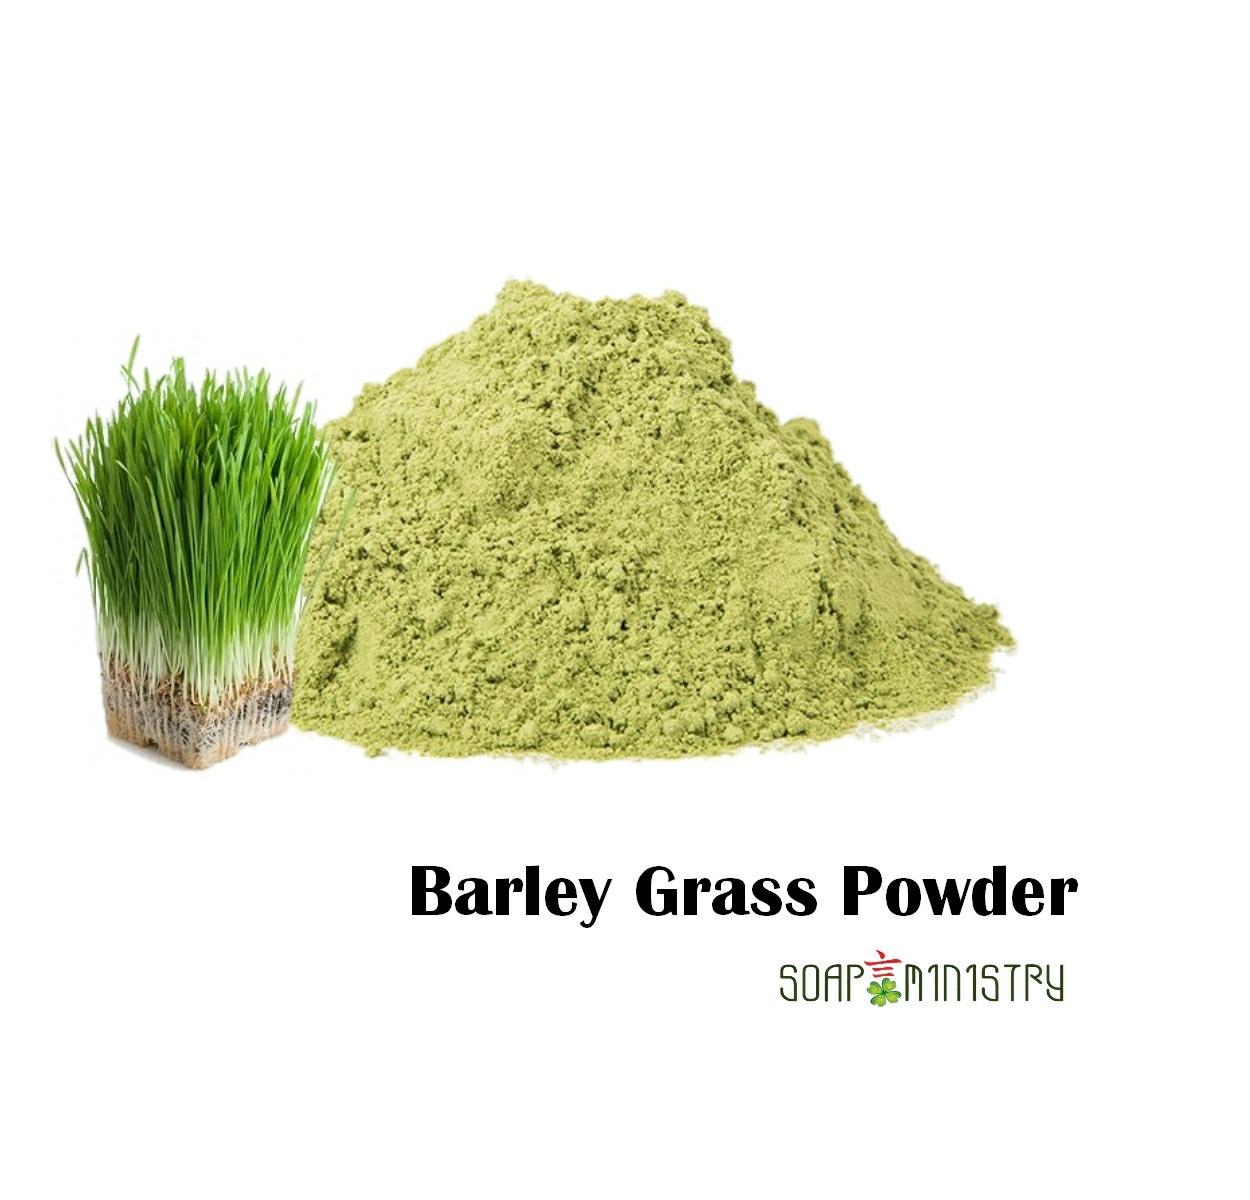 Barley Grass Powder 50g